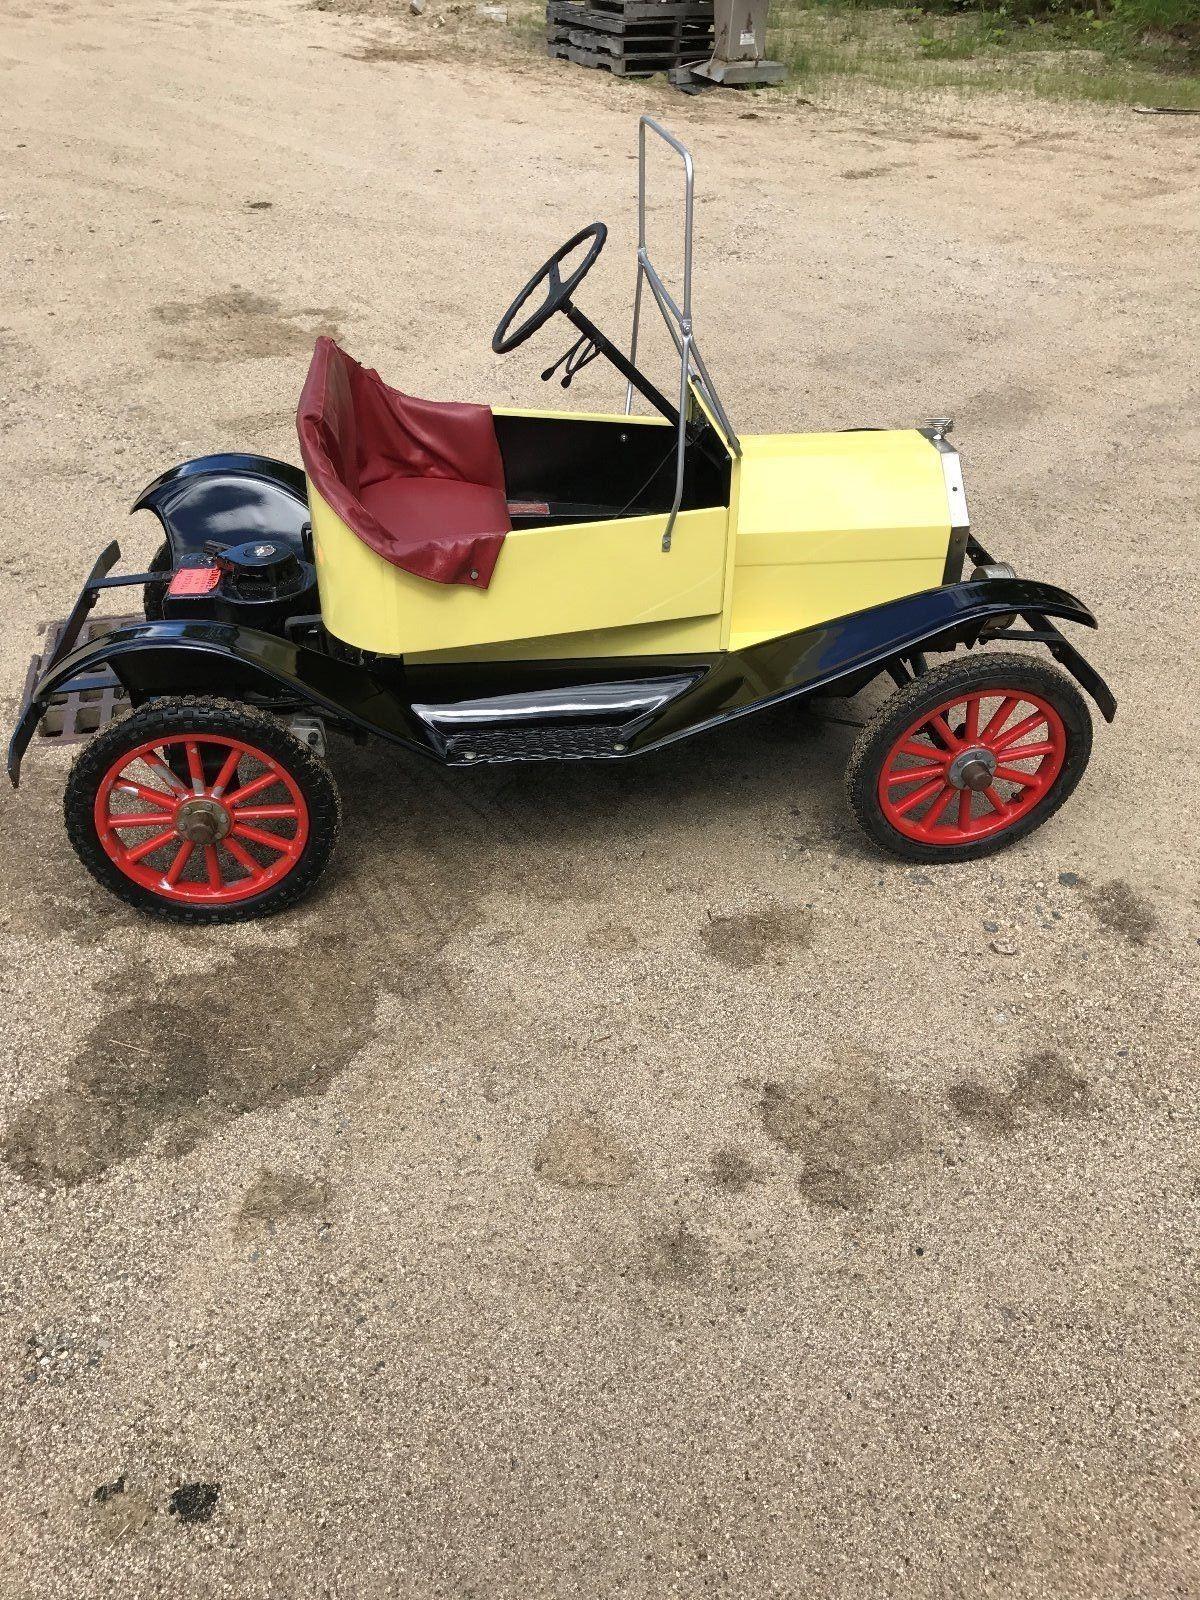 shriners parade car tin lizzie model T go kart Shriners